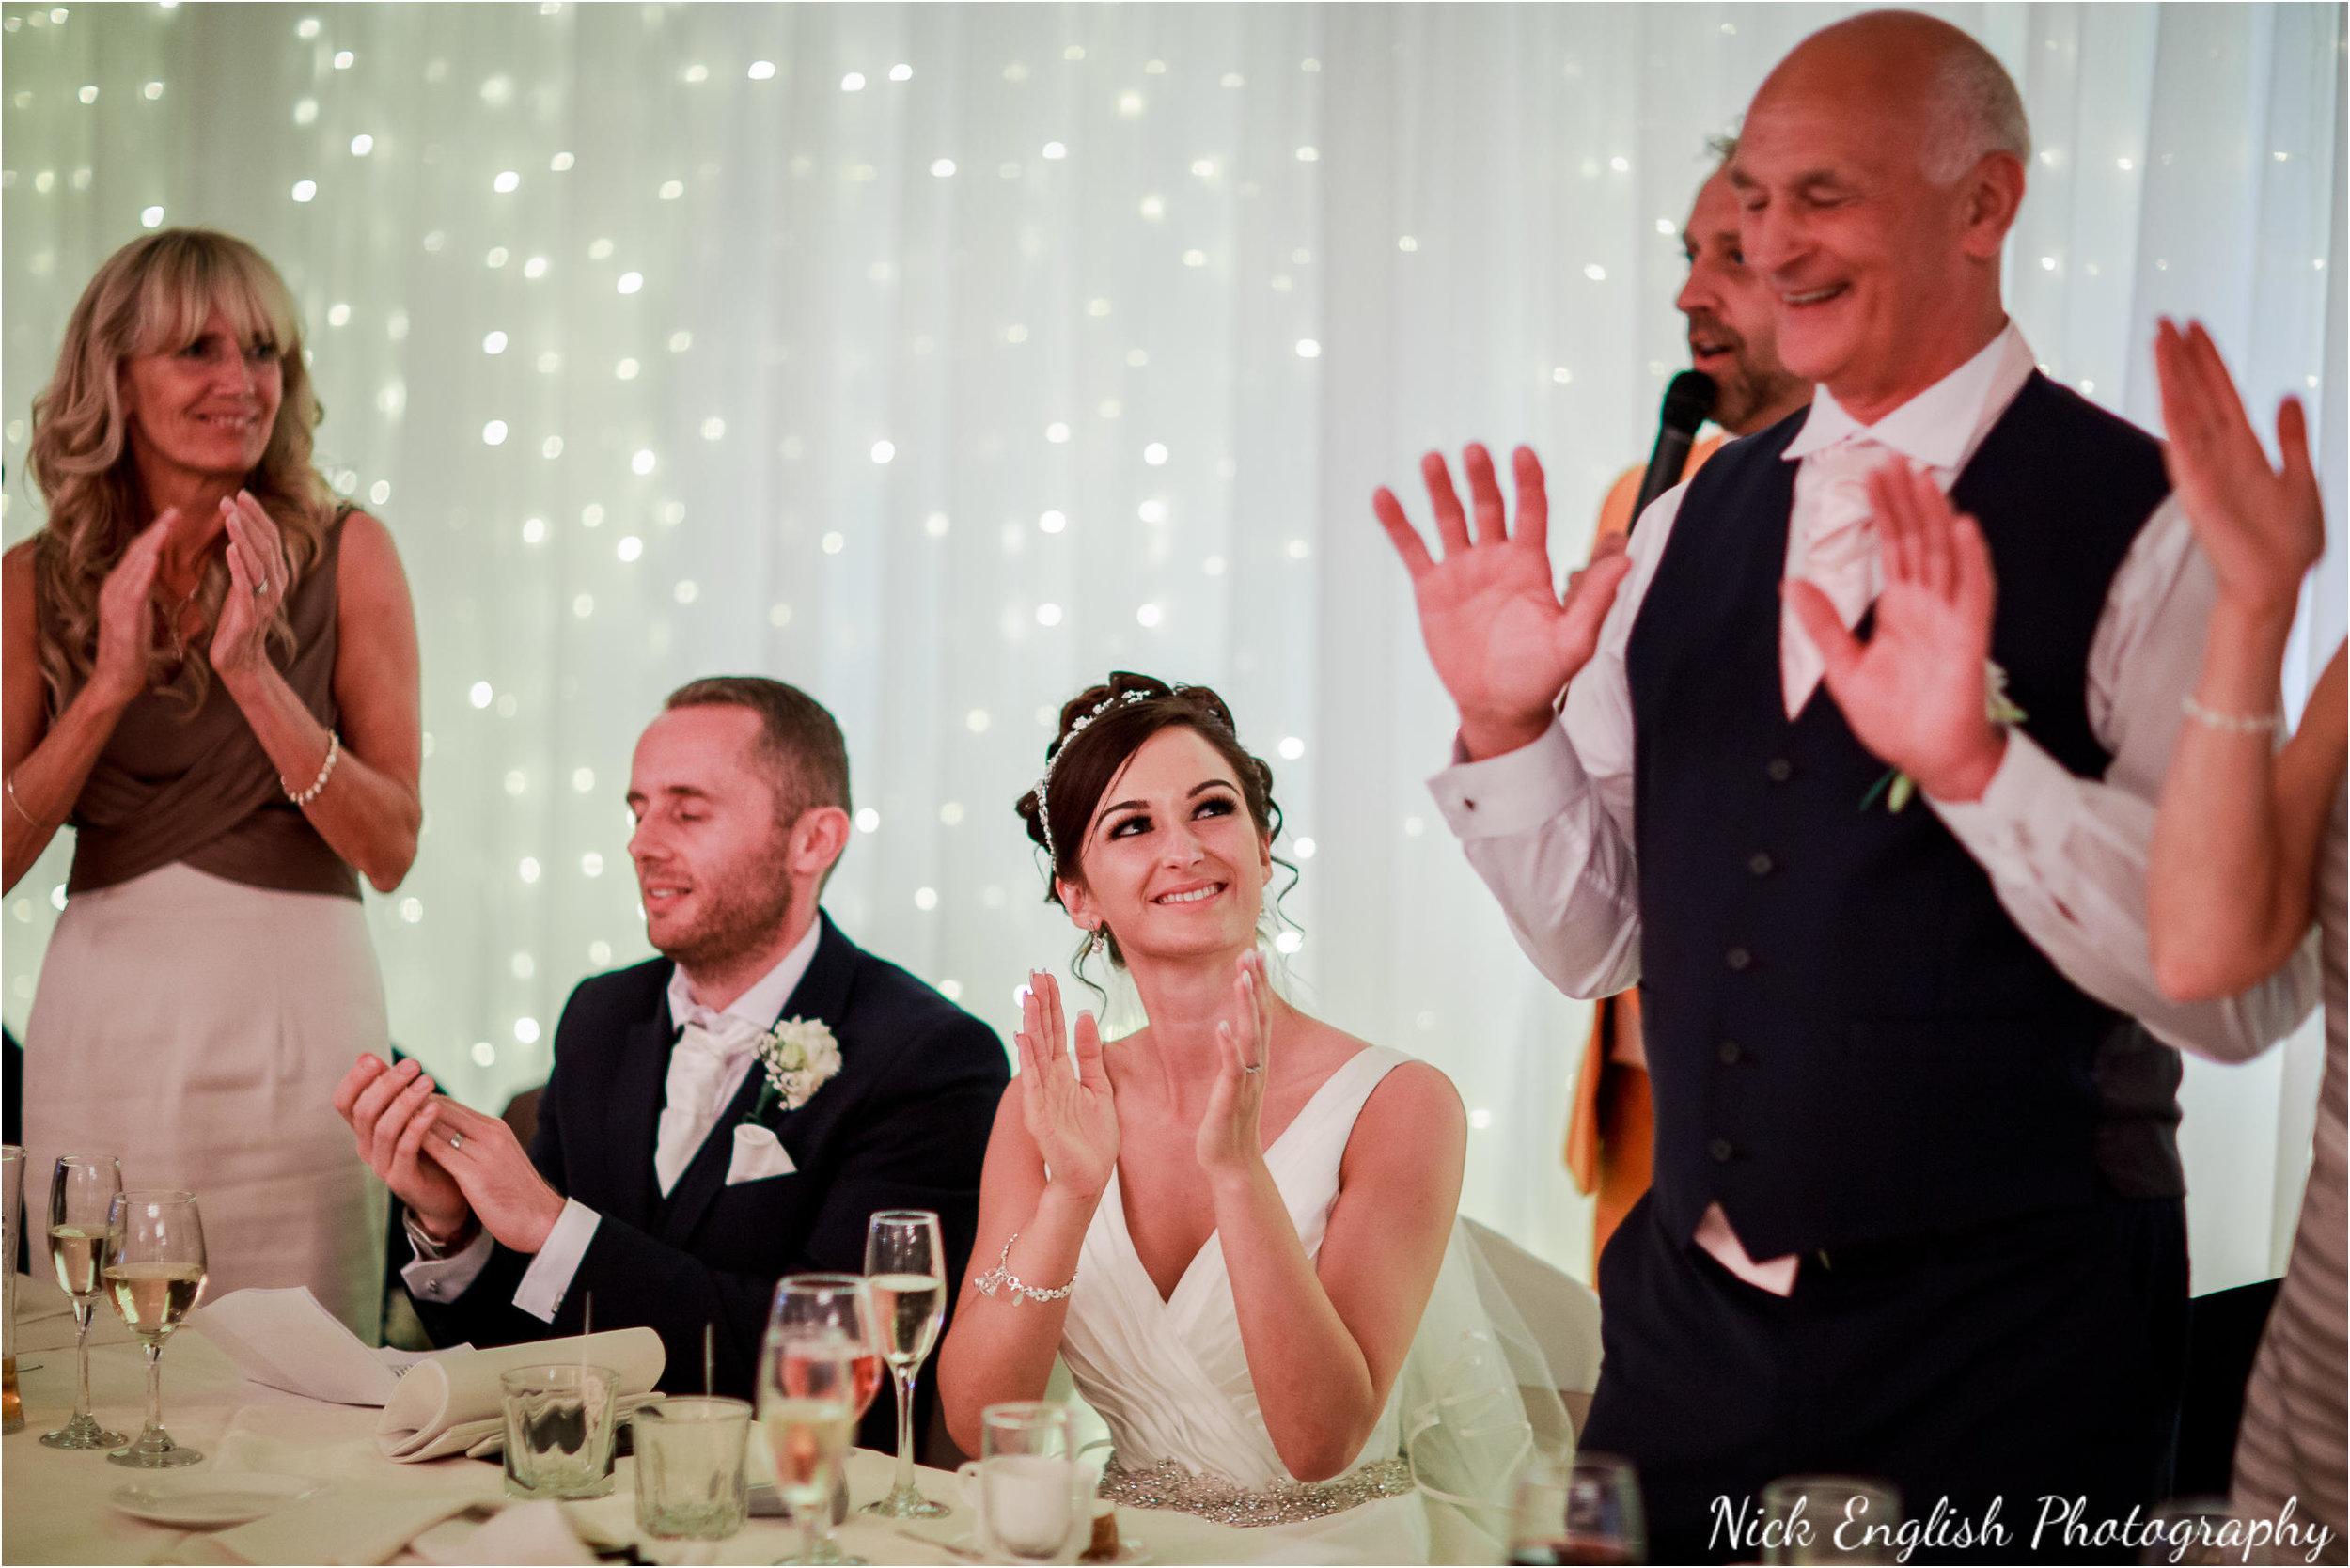 Emily David Wedding Photographs at Barton Grange Preston by Nick English Photography 170jpg.jpeg